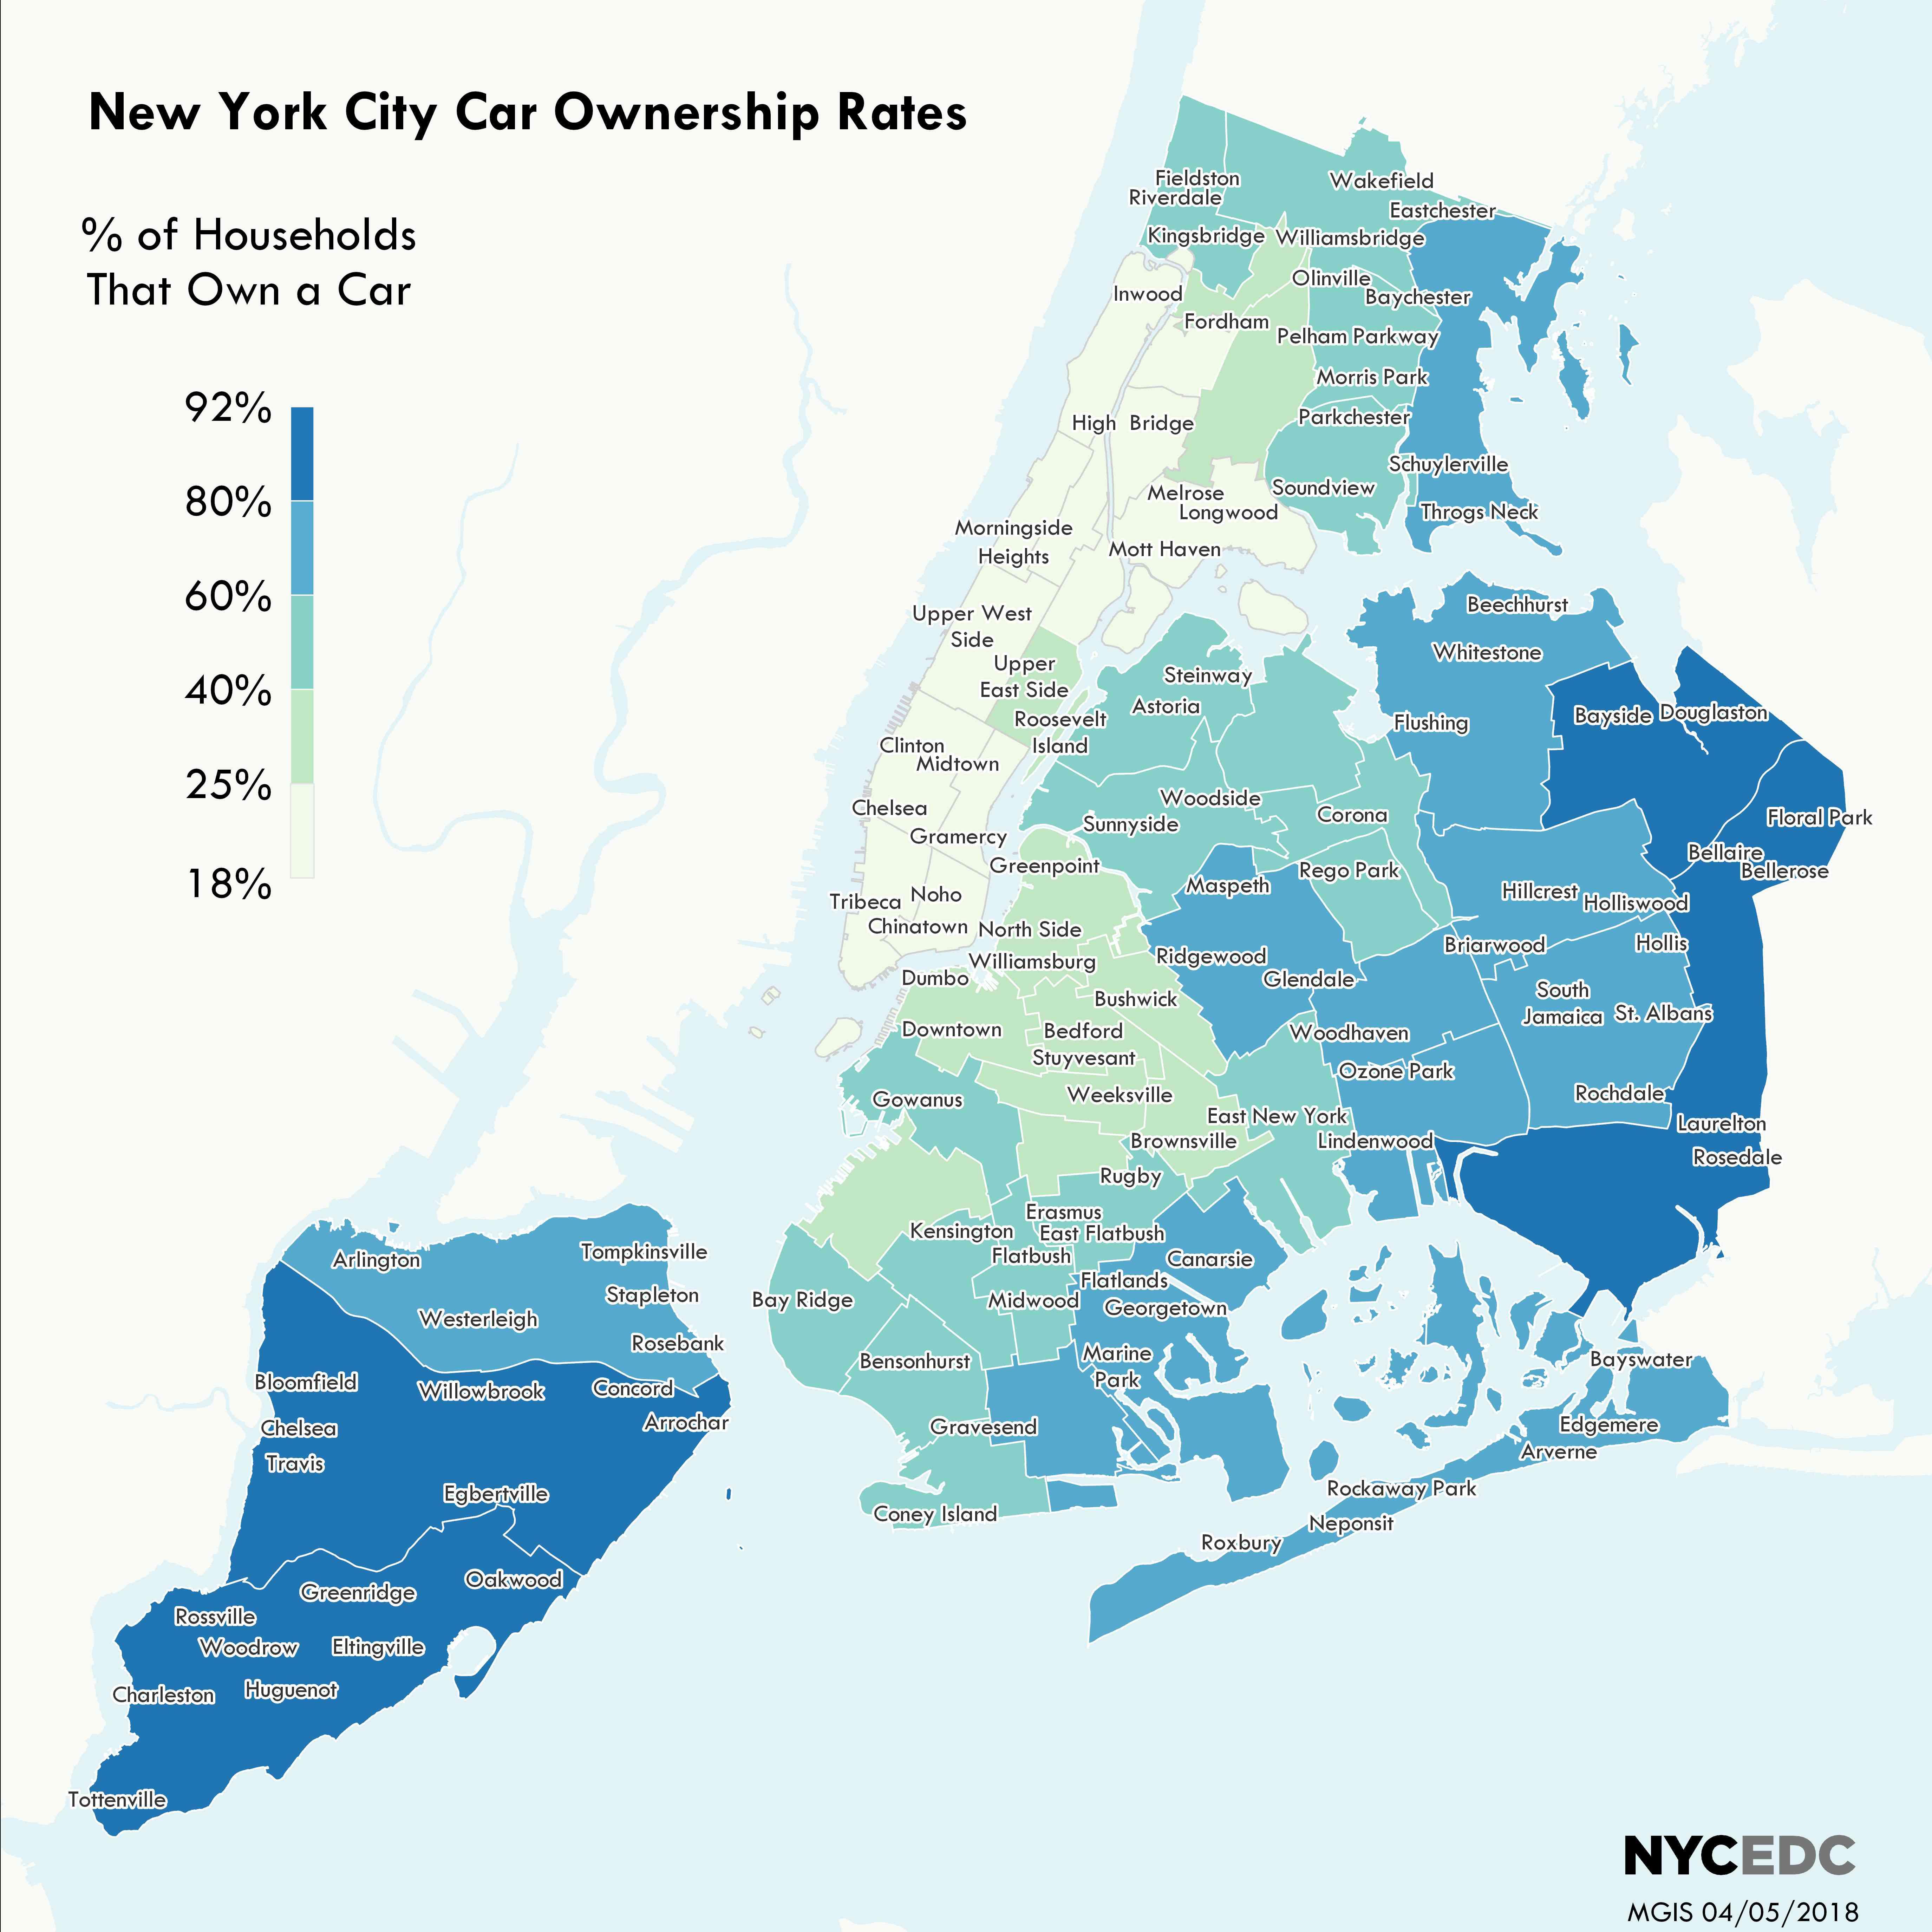 New York City car ownership